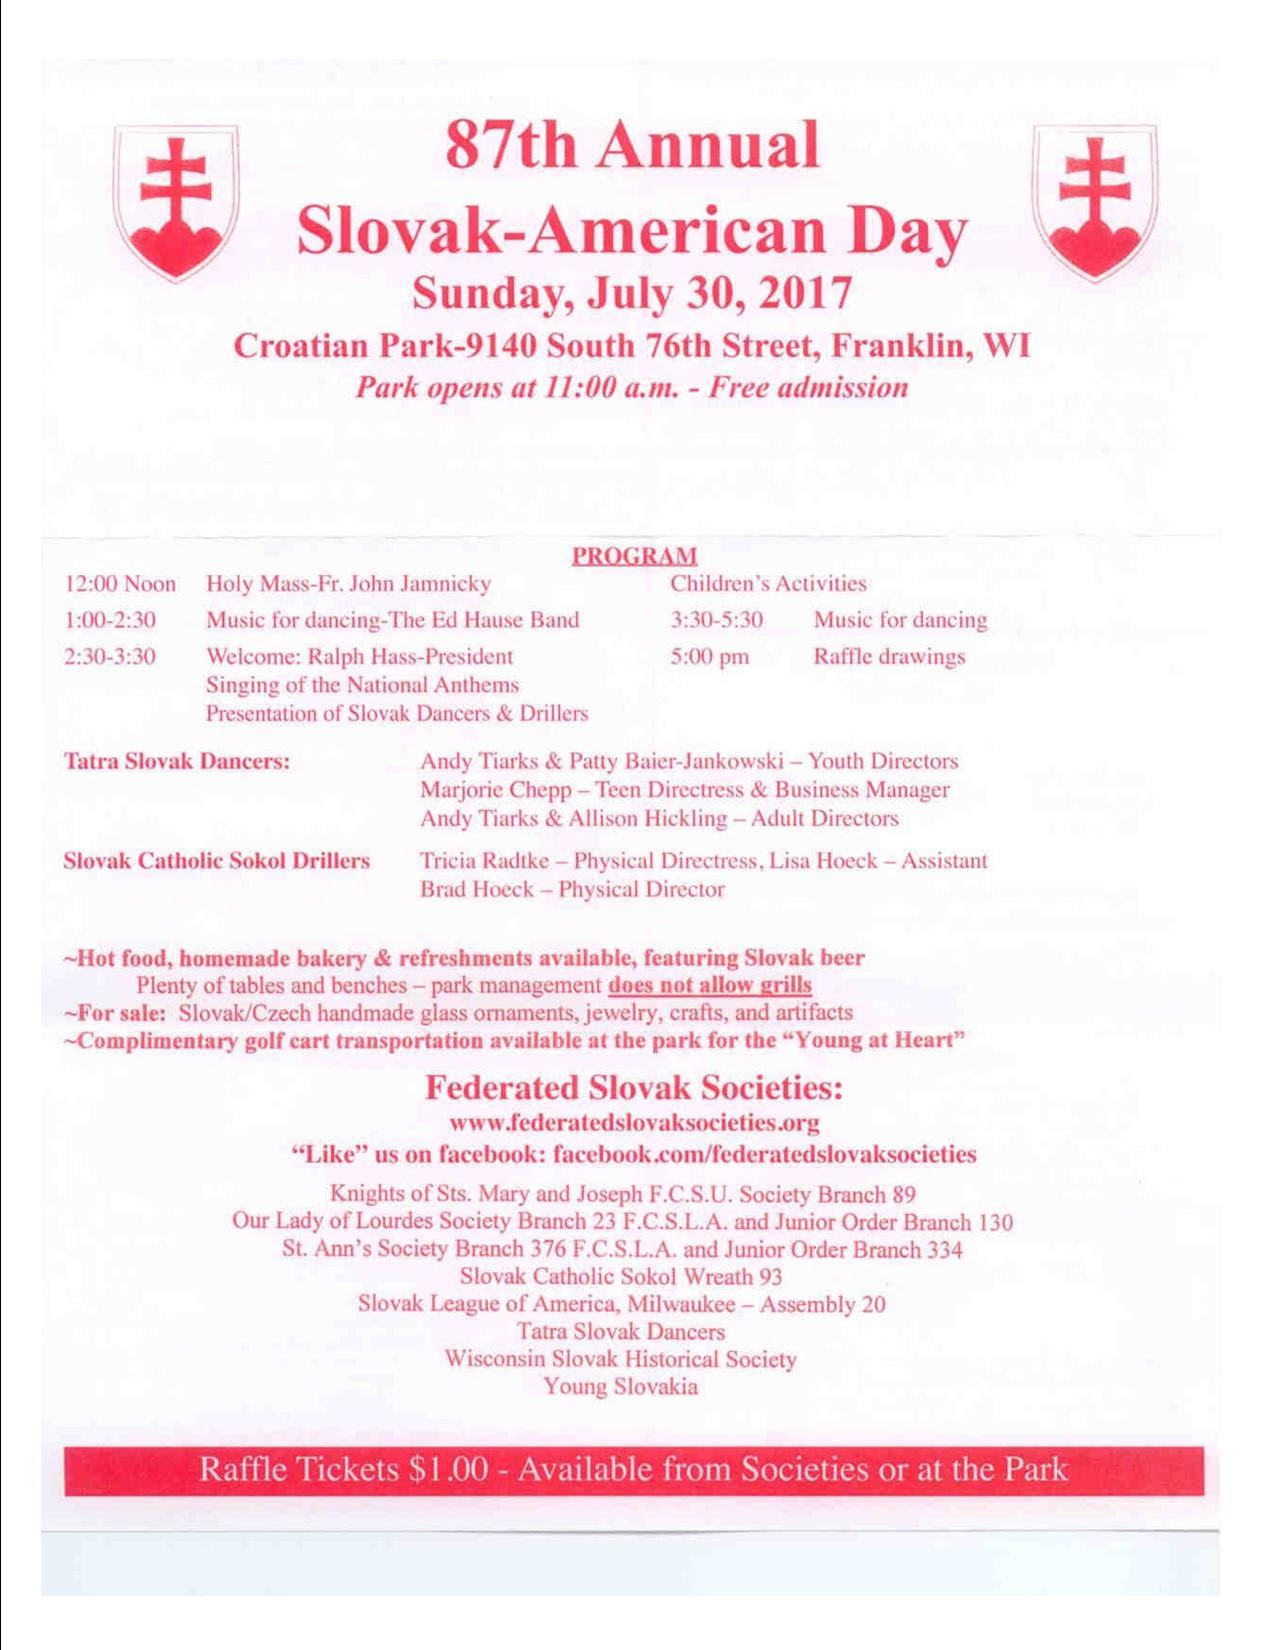 87th Slovak Day